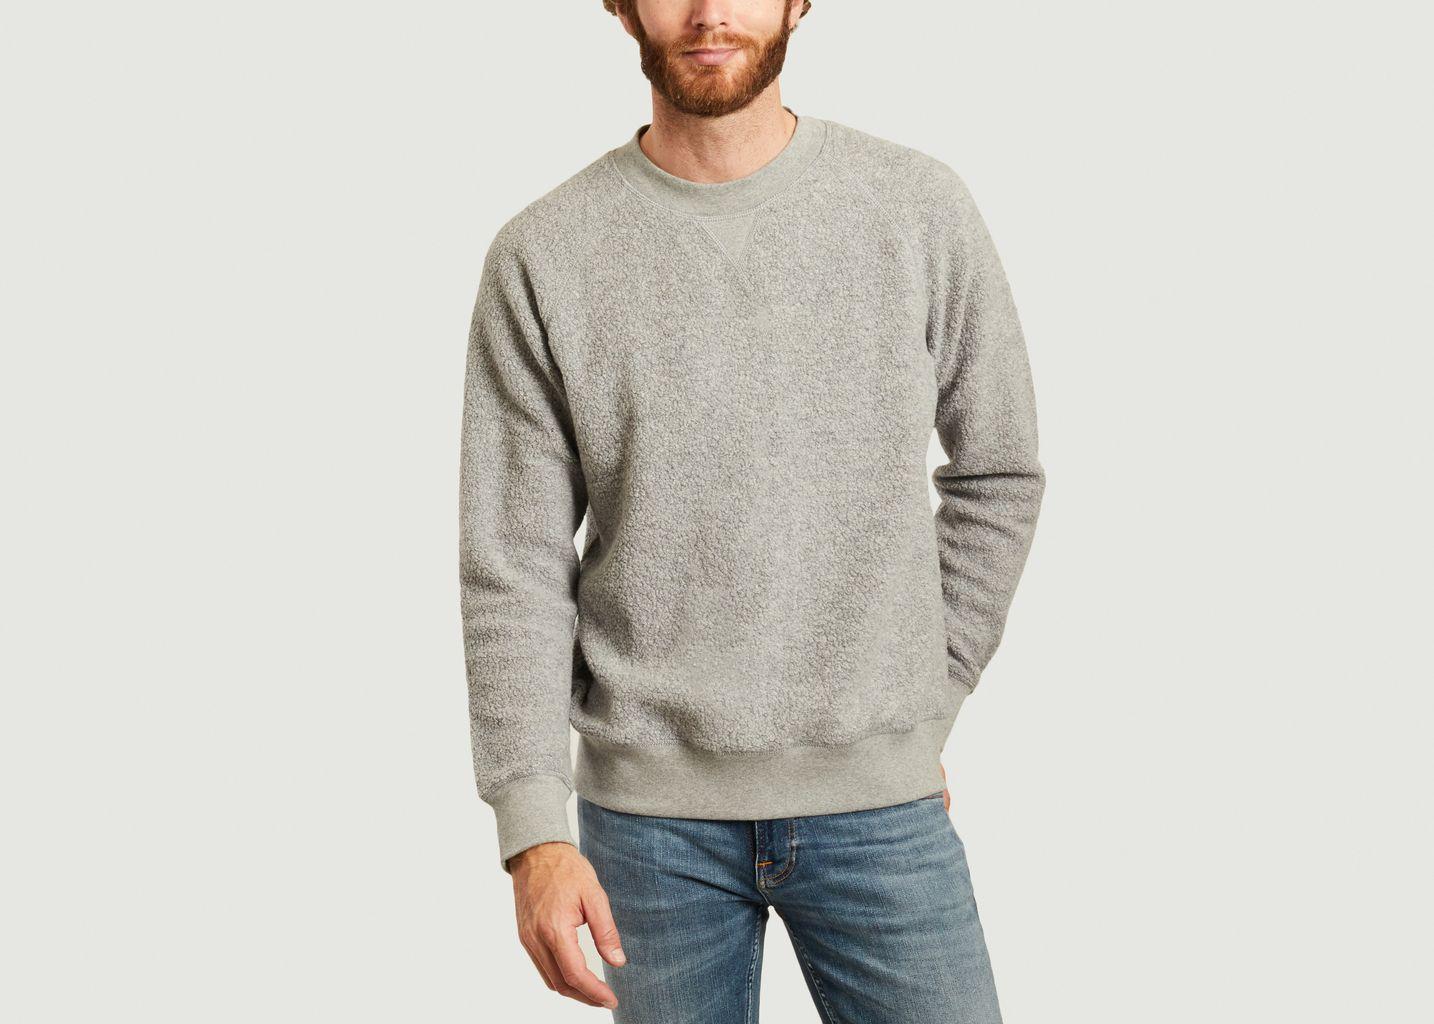 Sweatshirt raglan - Closed